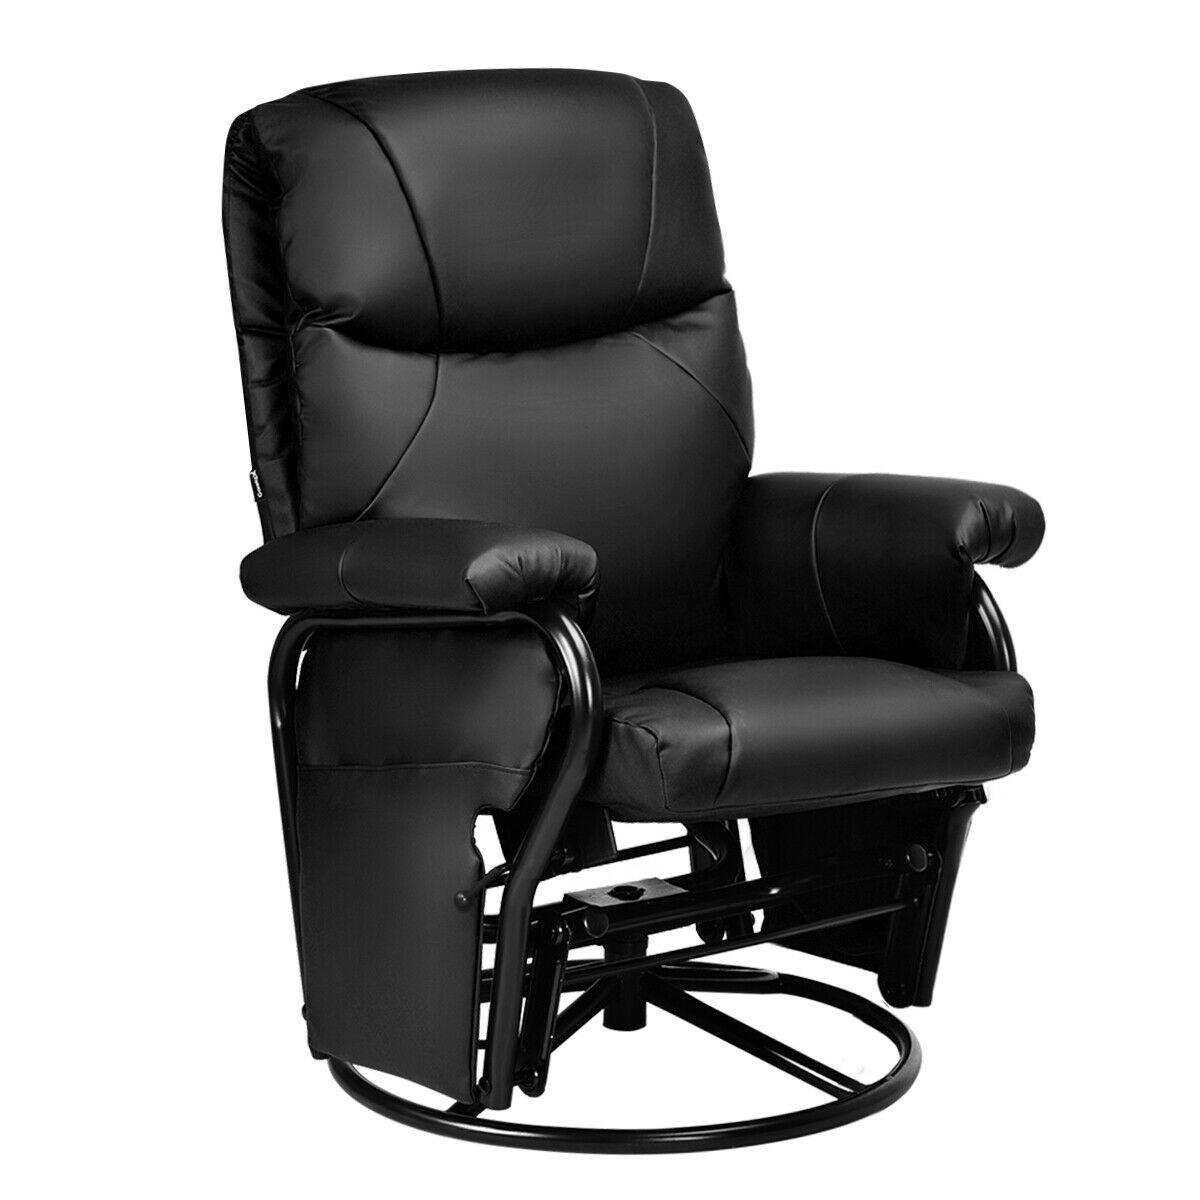 Glider Swivel Rocking PU Leather Recliner Chair-Black